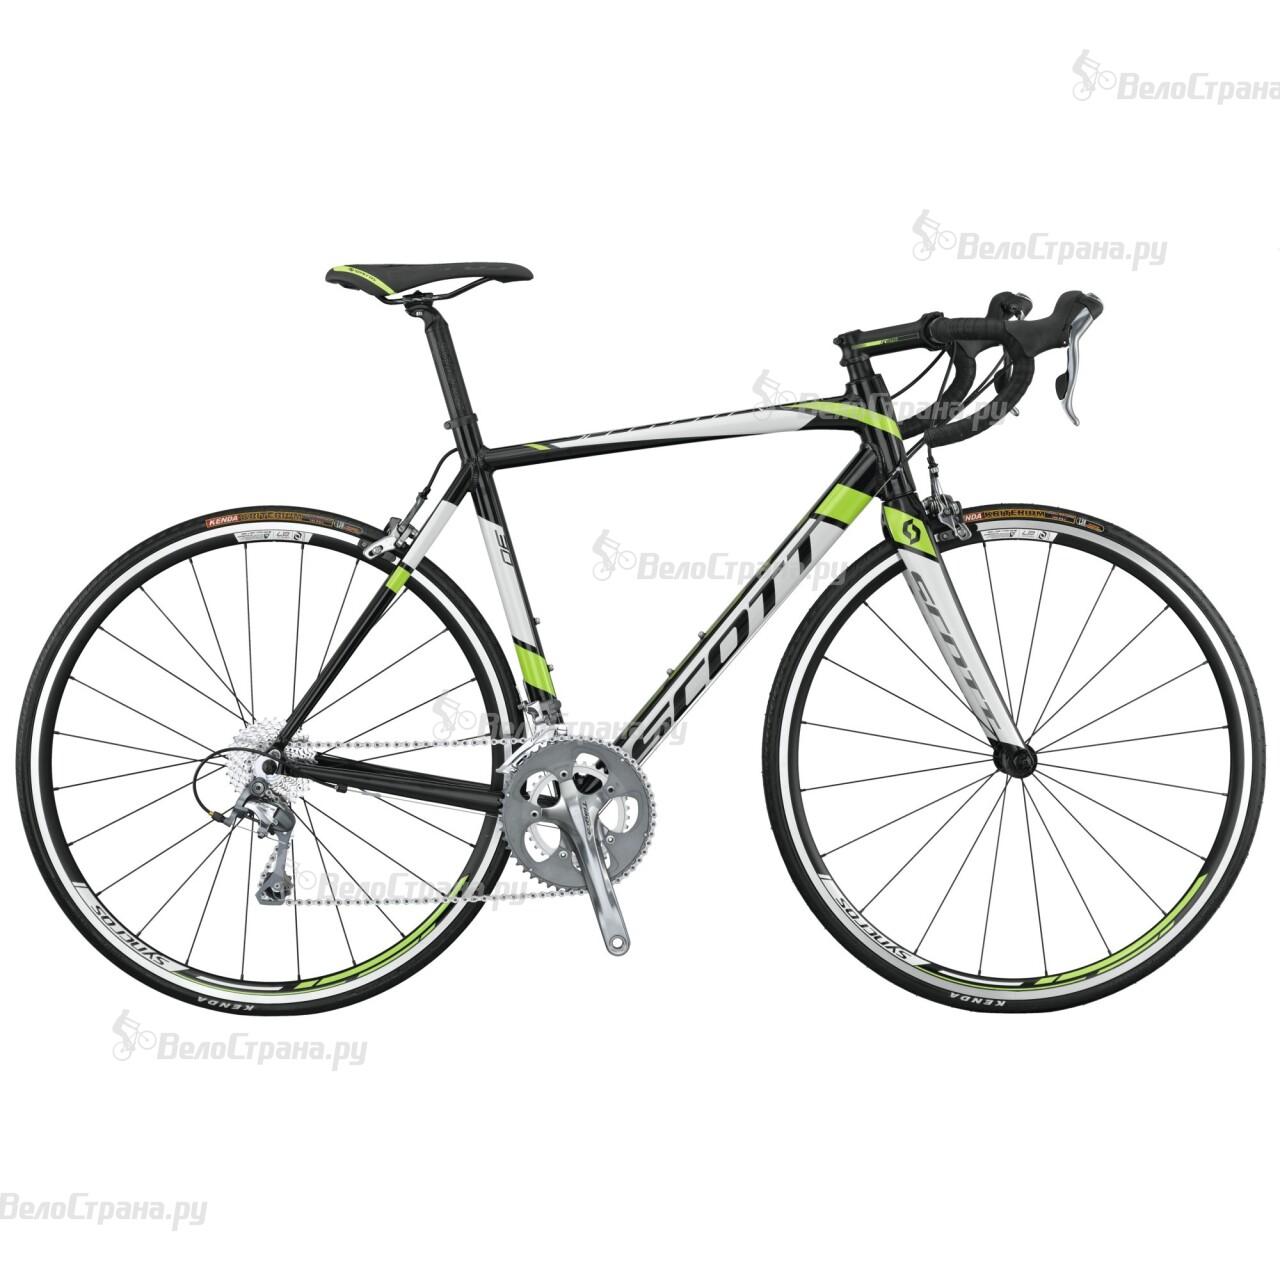 Велосипед Scott Speedster 30 Compact (2015)